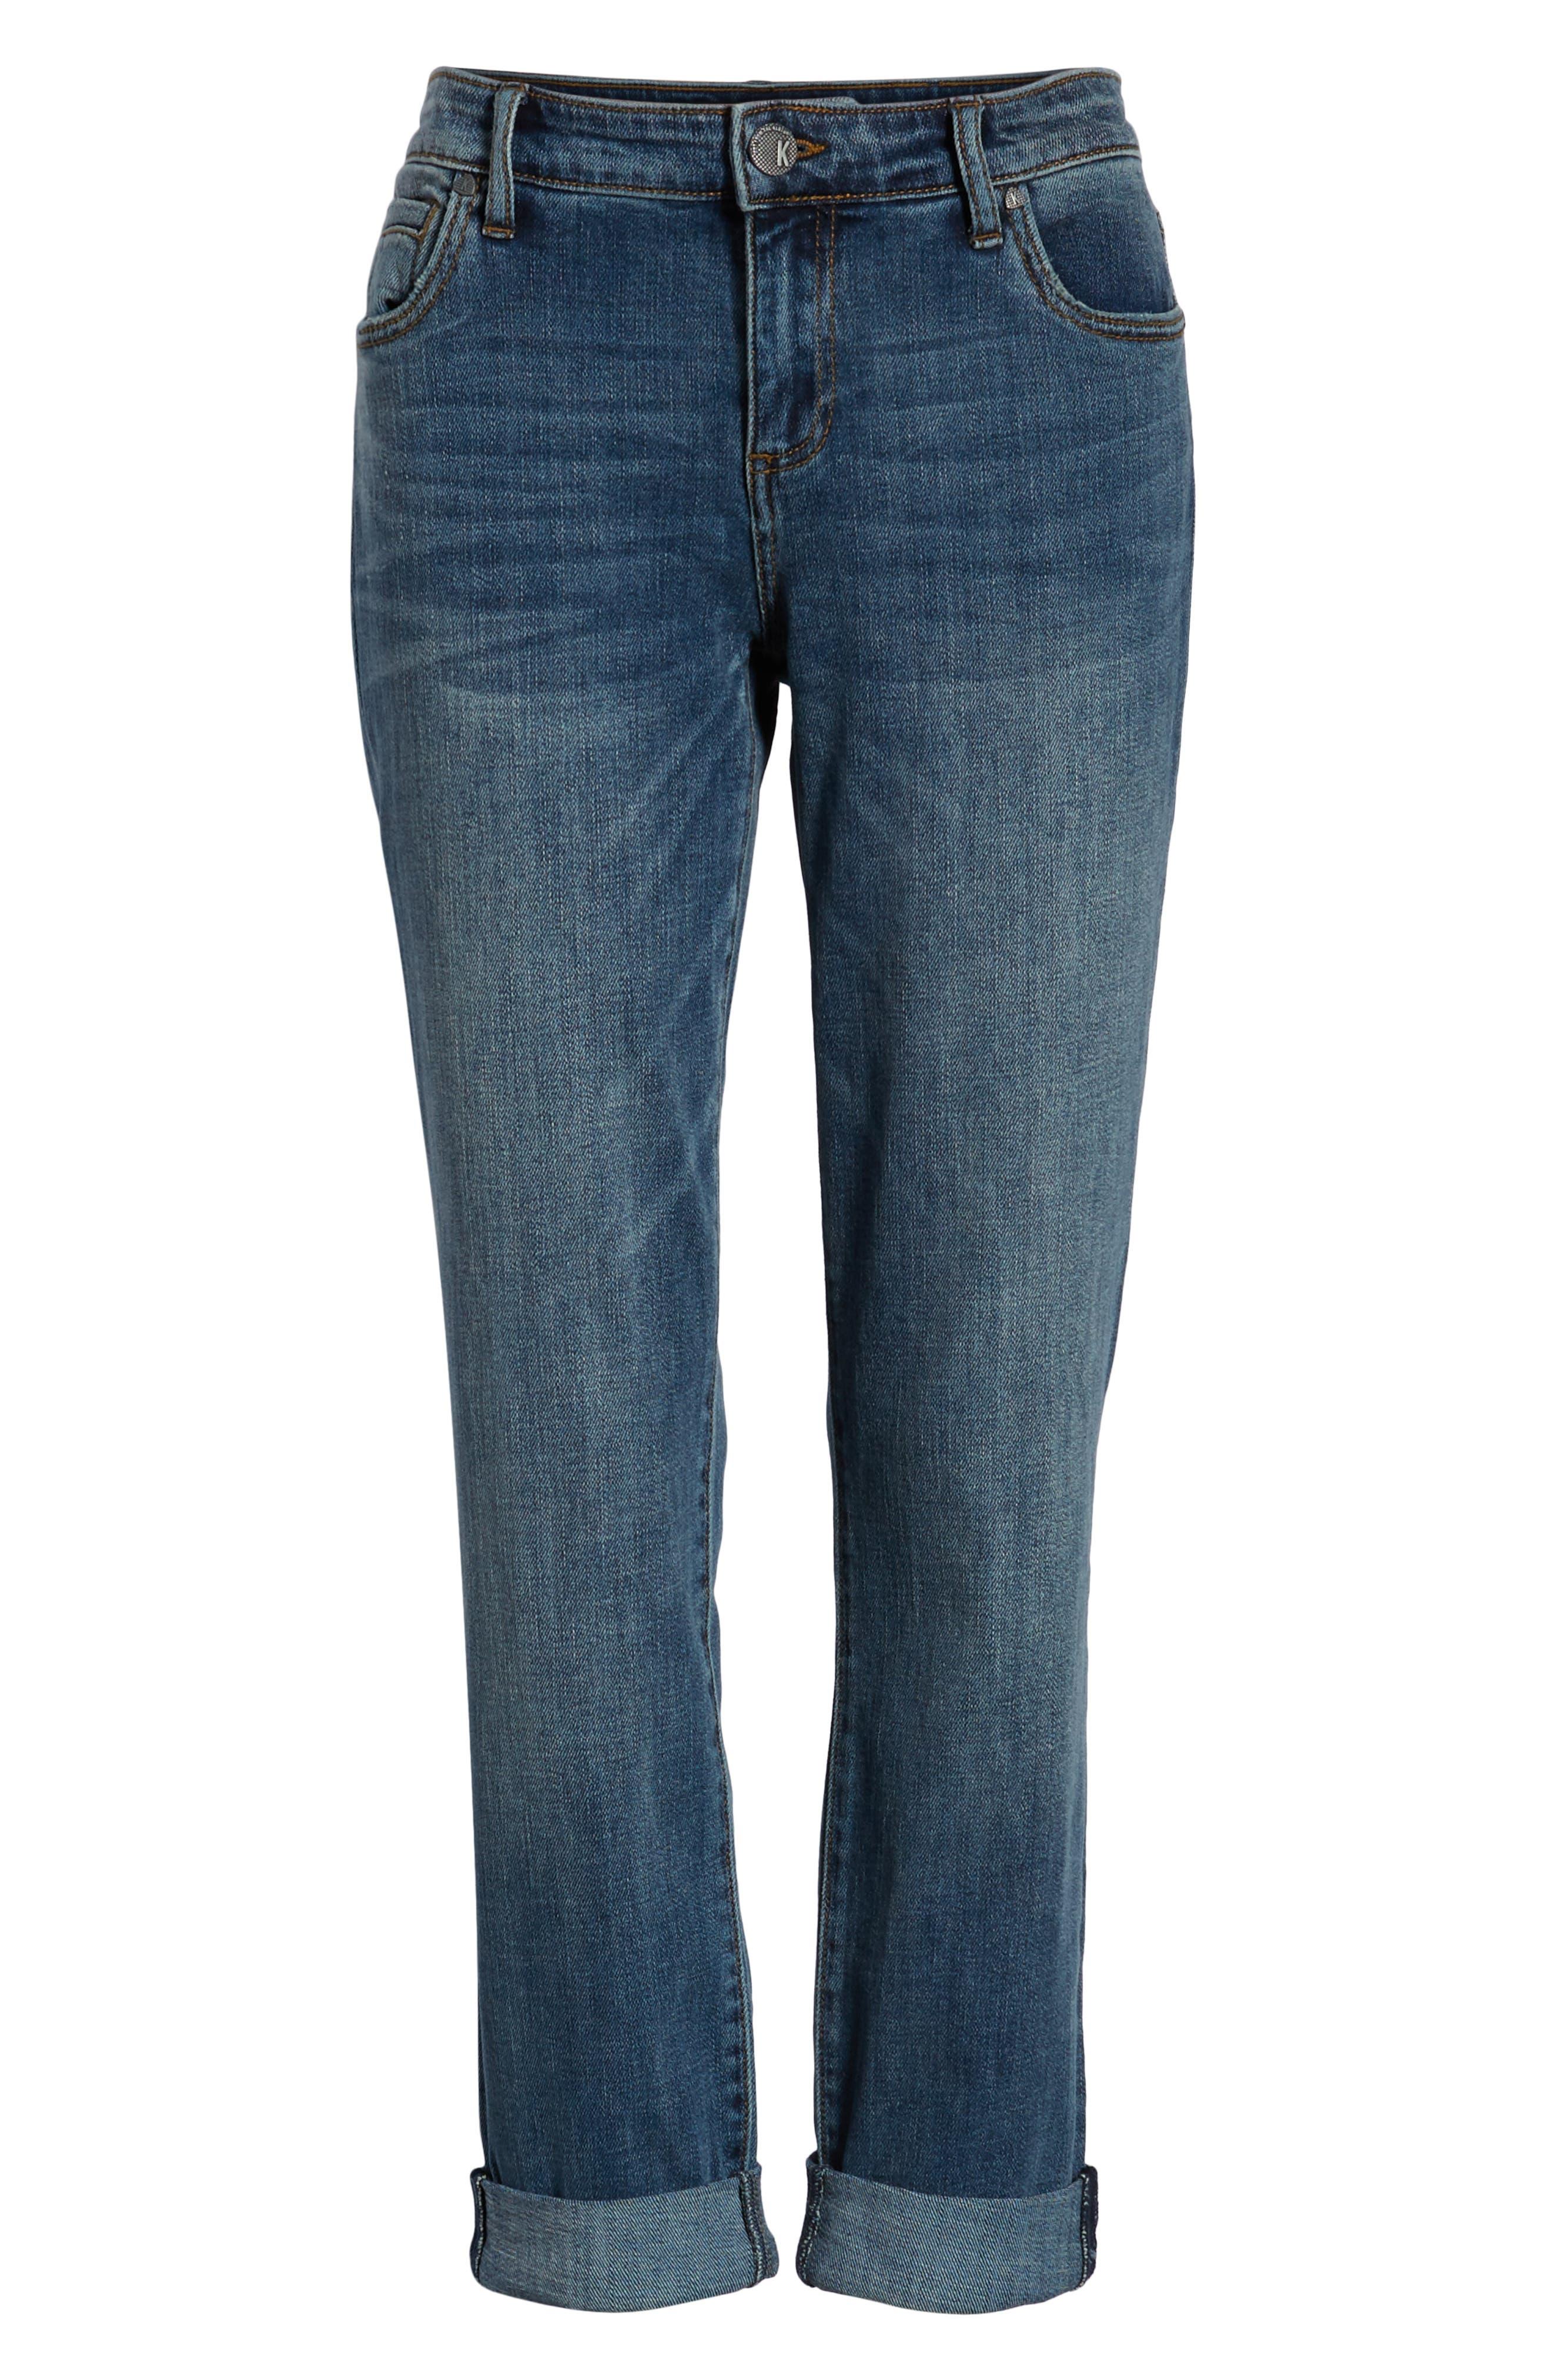 KUT FROM THE KLOTH,                             Catherine Slim Boyfriend Jeans,                             Alternate thumbnail 7, color,                             VERSION W/ MEDIUM BASE WASH